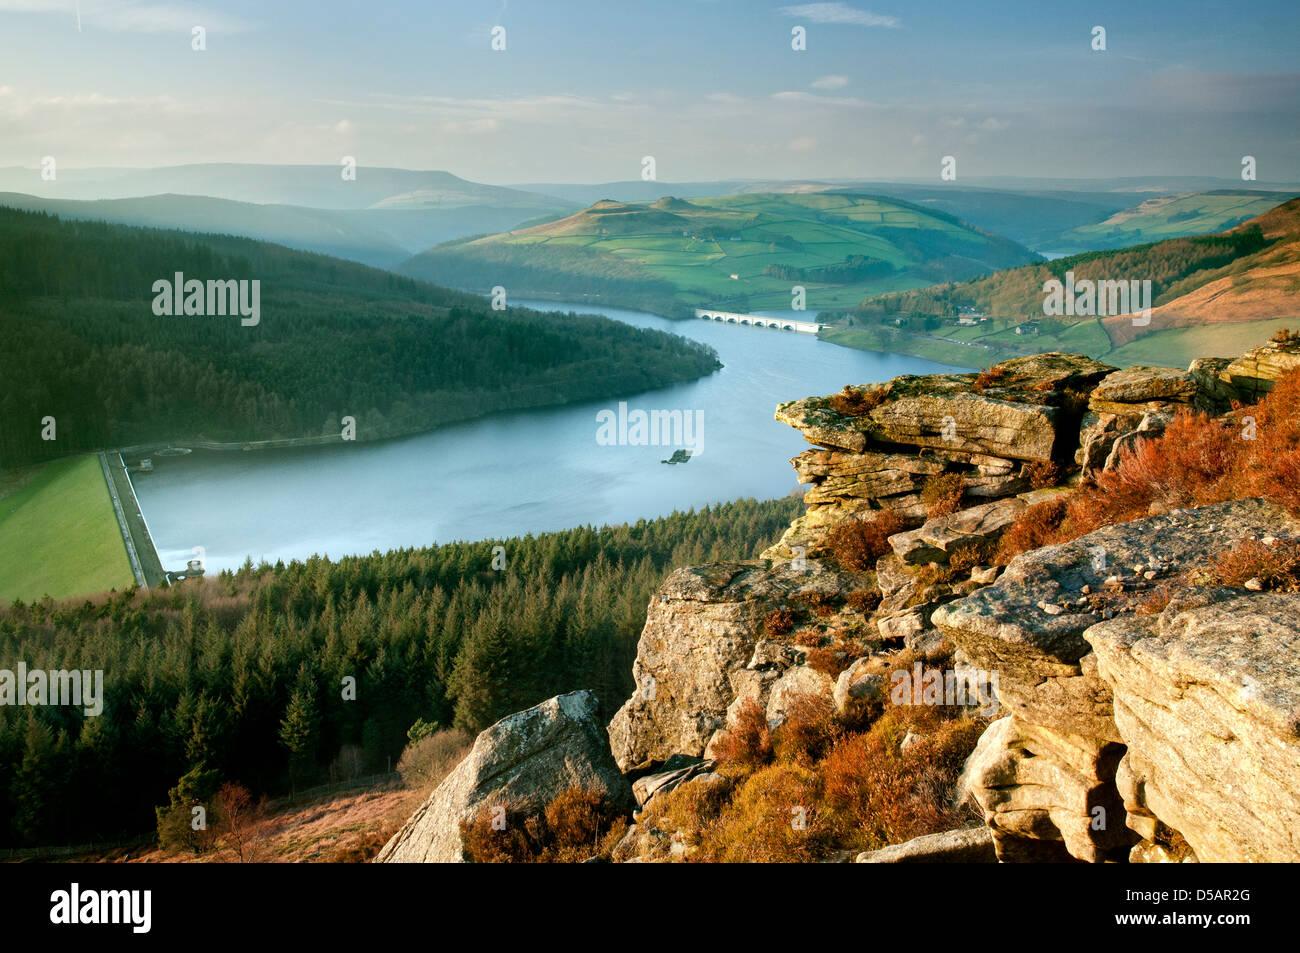 Ladybower Reservoir seen from Bamford Edge, The Peak District National Park. - Stock Image